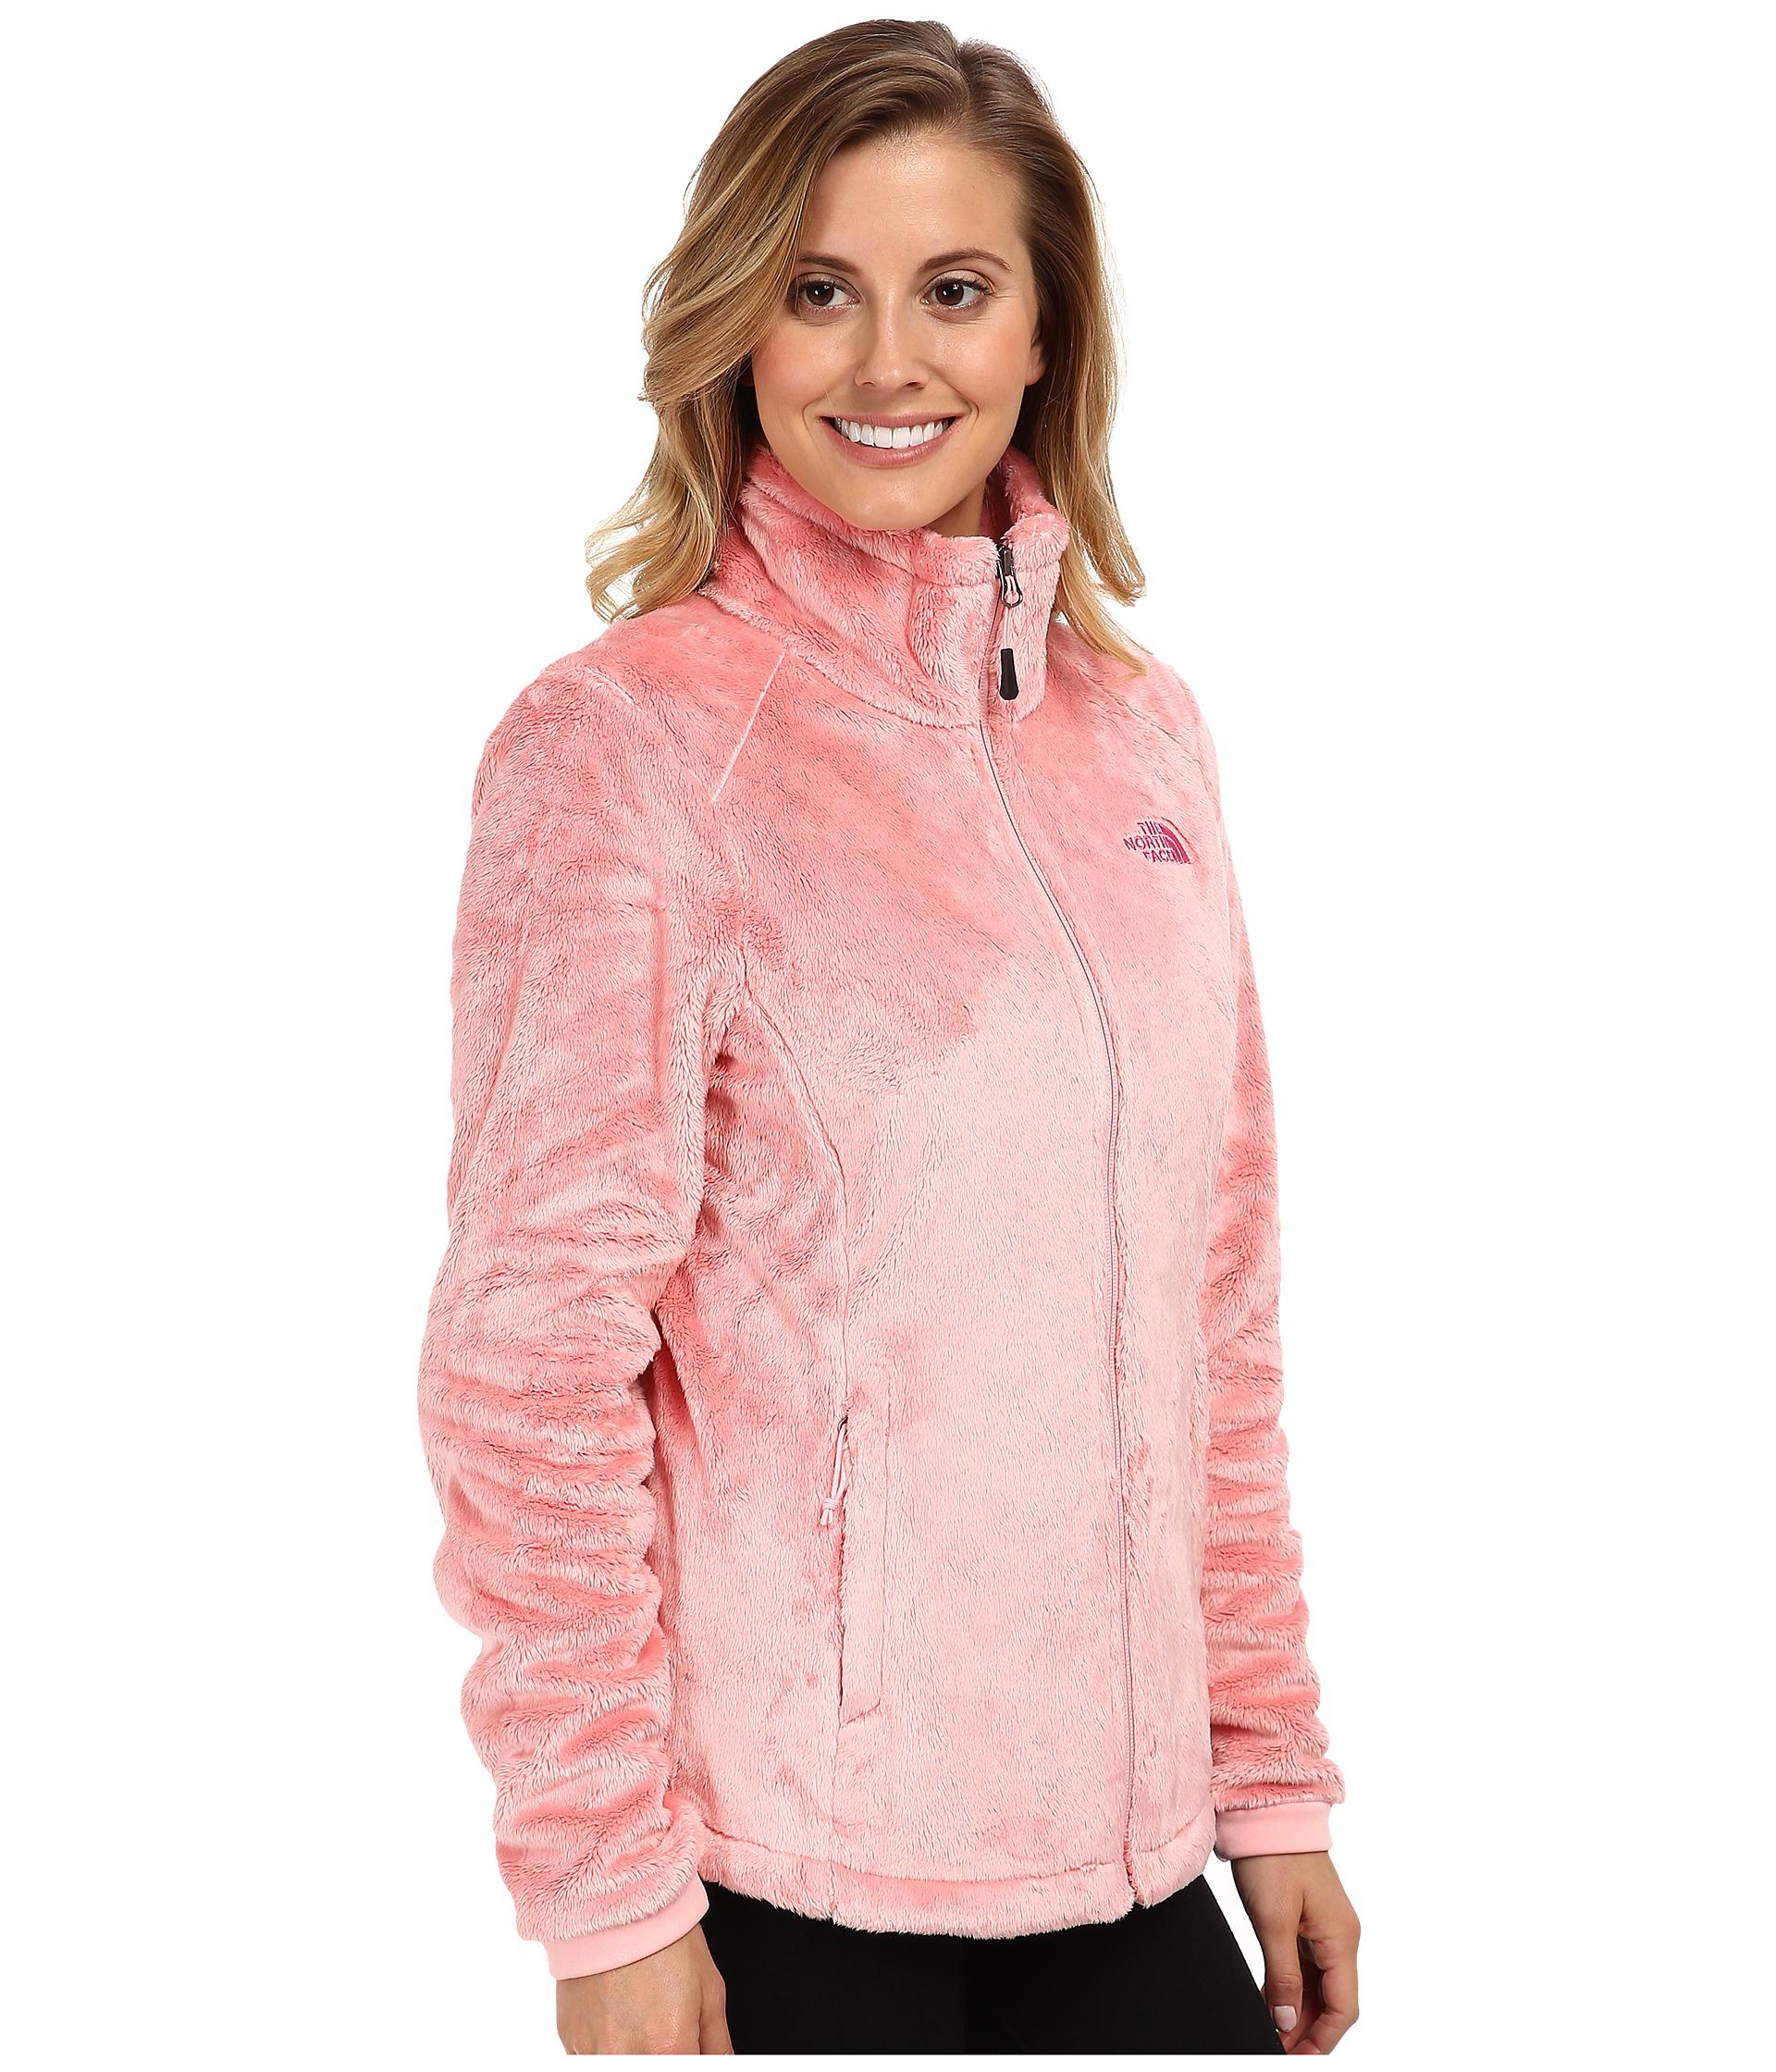 a5a6a8d9d Women's Pink Ribbon Osito 2 Jacket